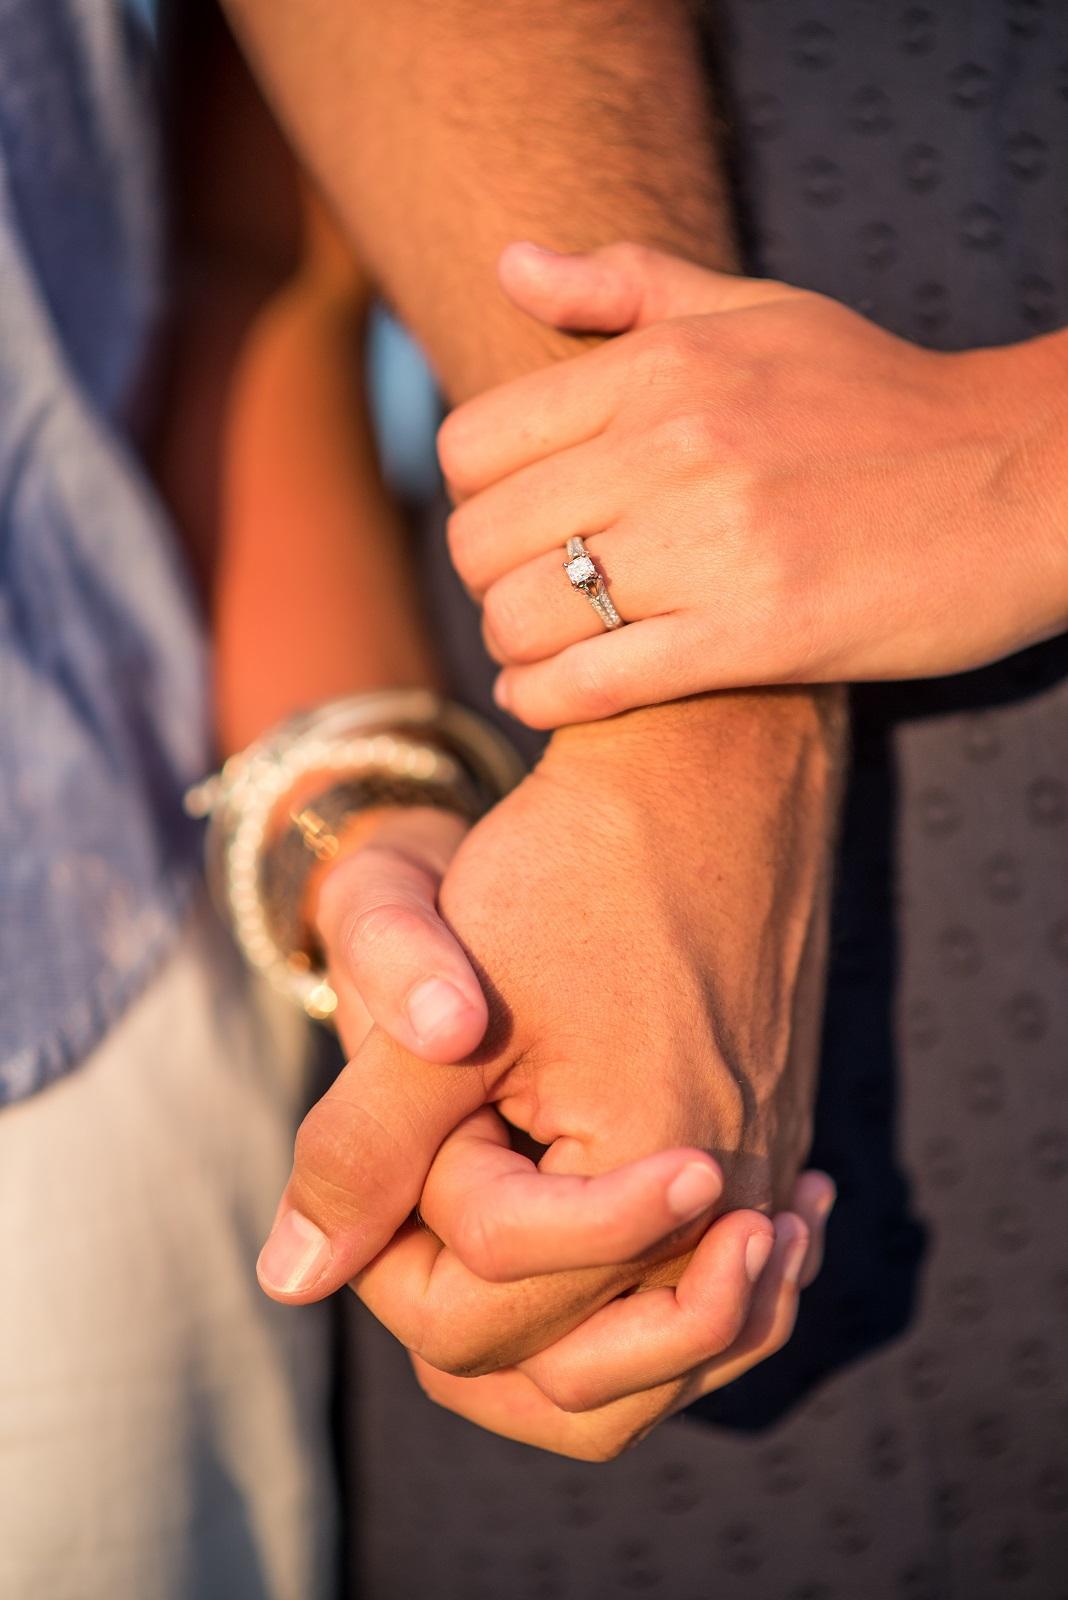 Surprise Proposal Sneak Peek